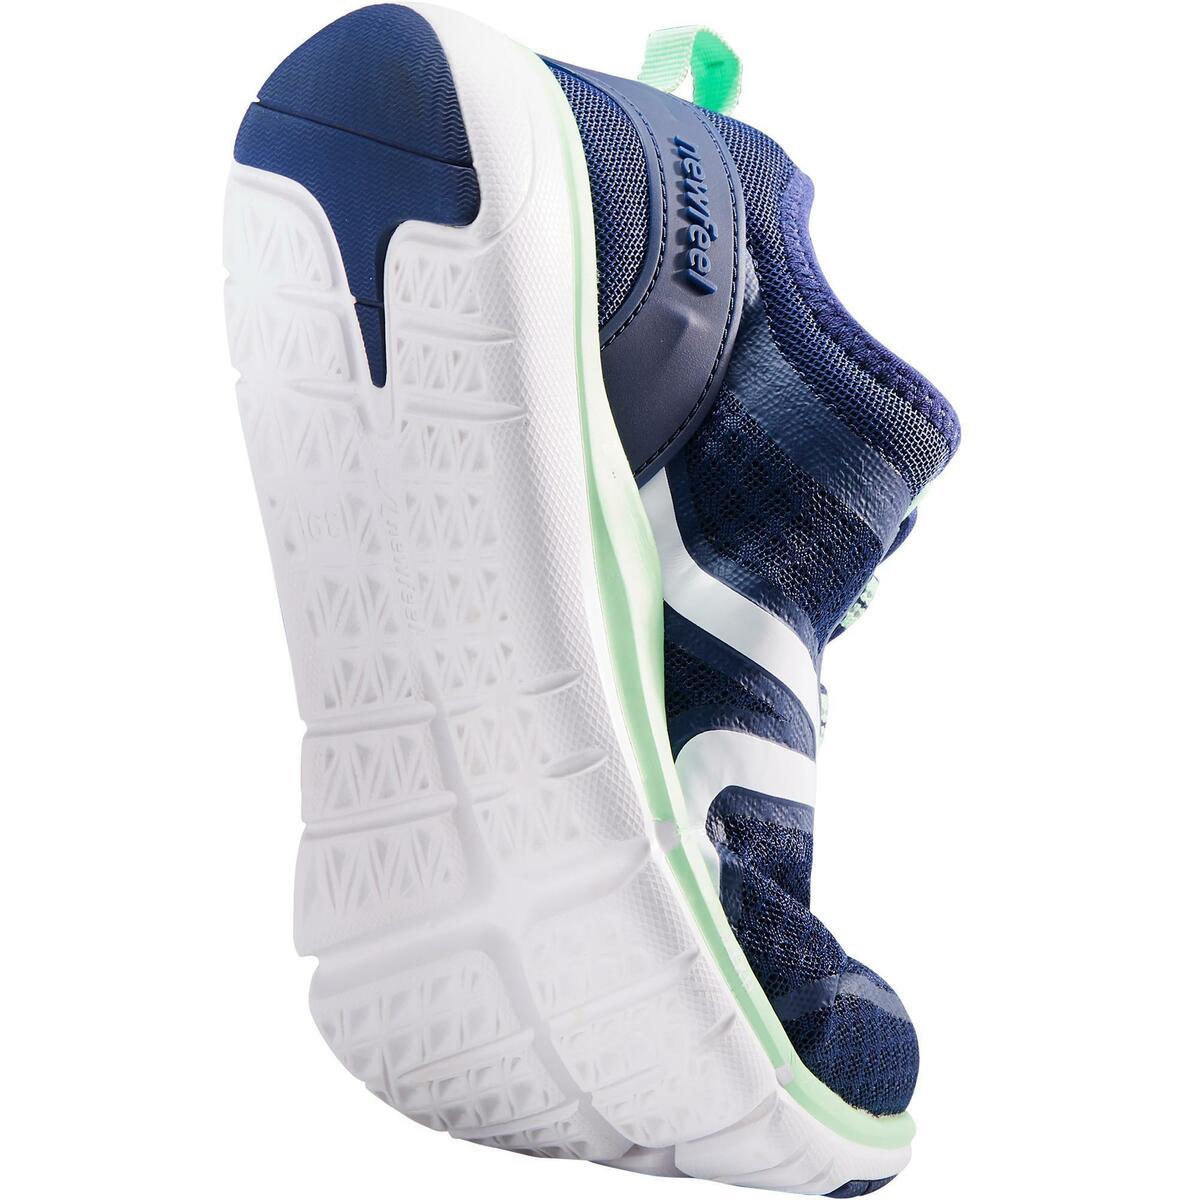 Bild 3 von Walkingschuhe Soft 540 Mesh Damen marineblau/grün